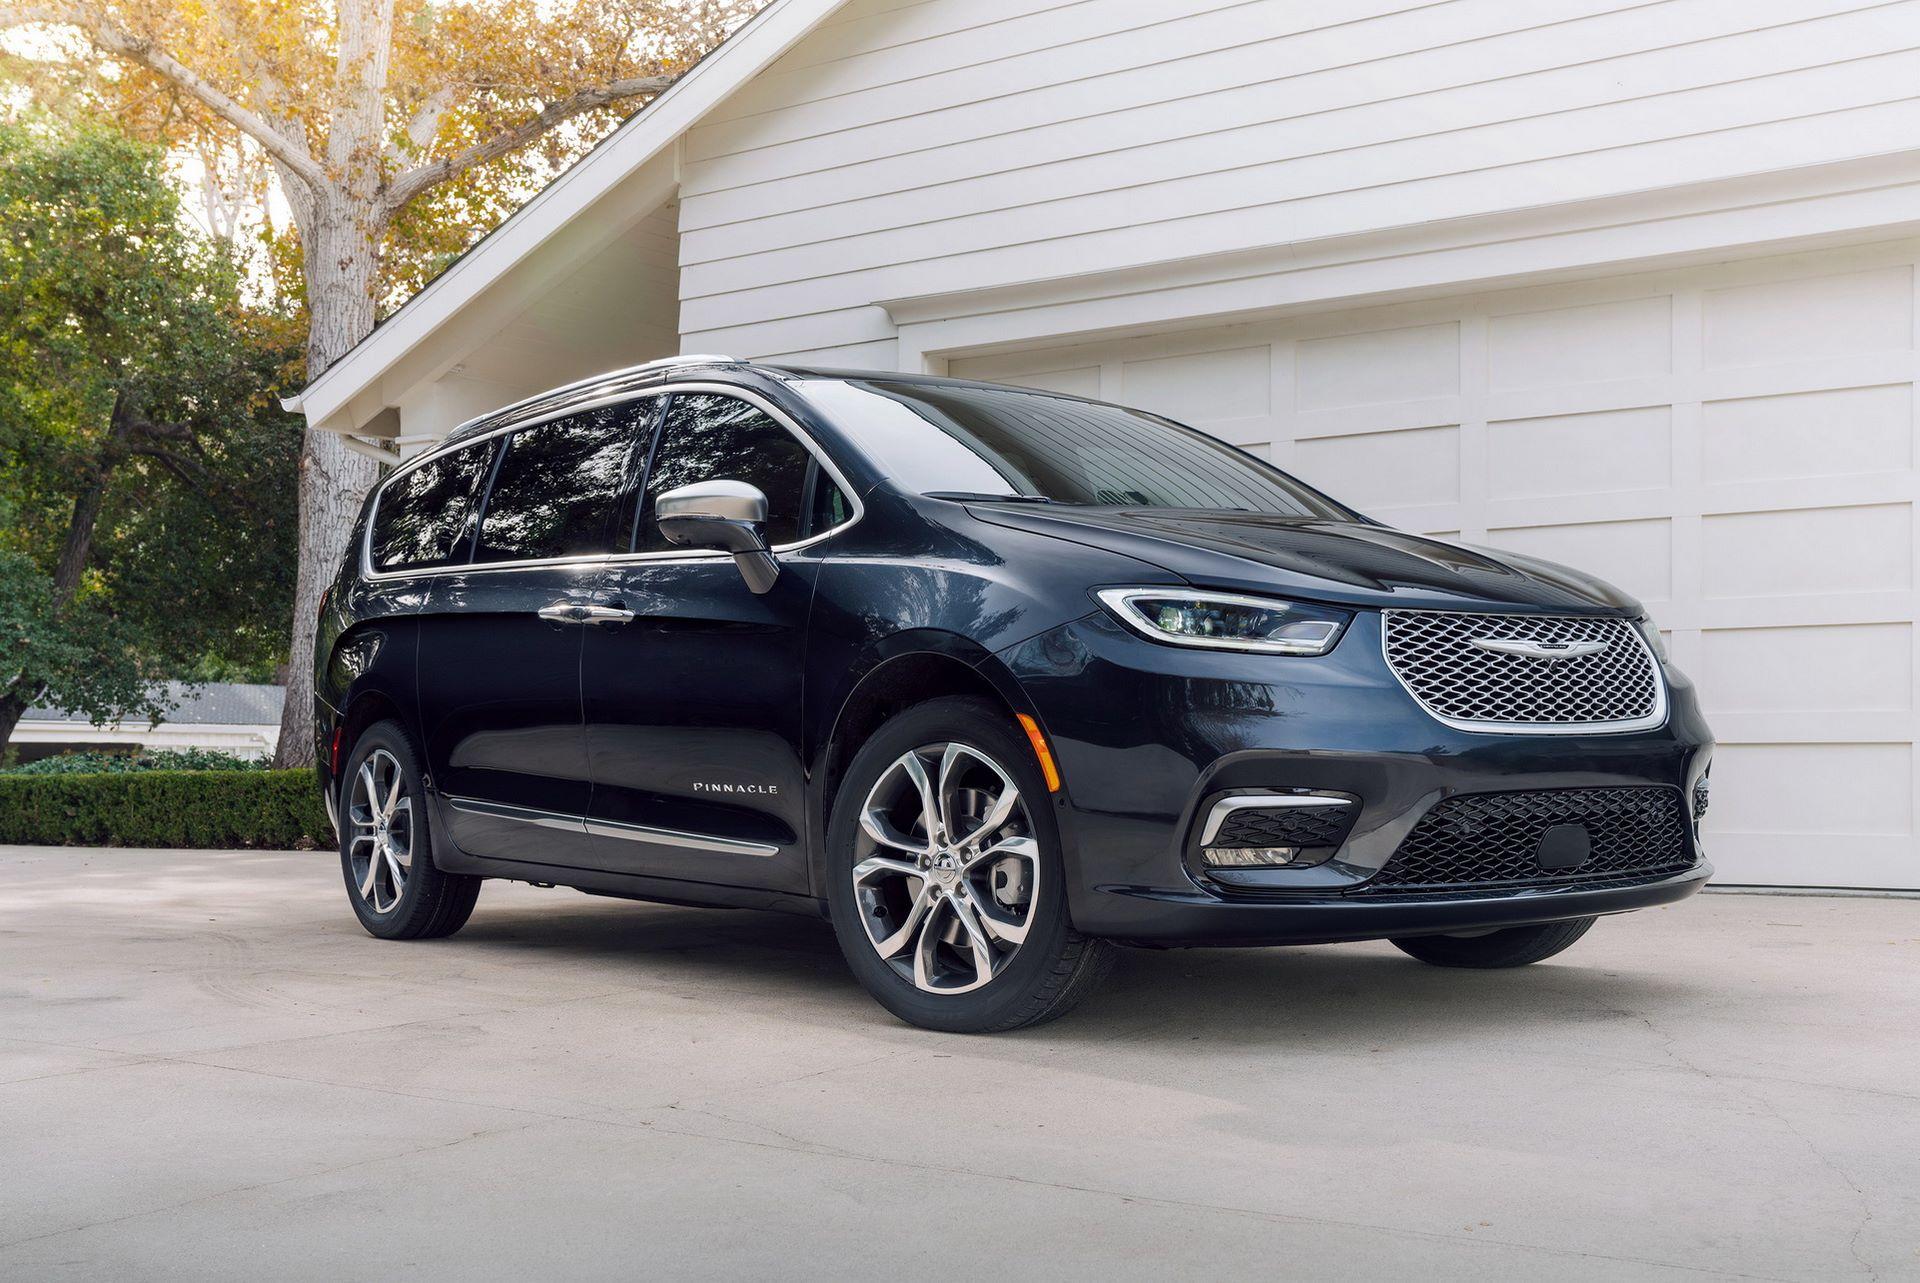 2021-Chrysler-Pacifica-9